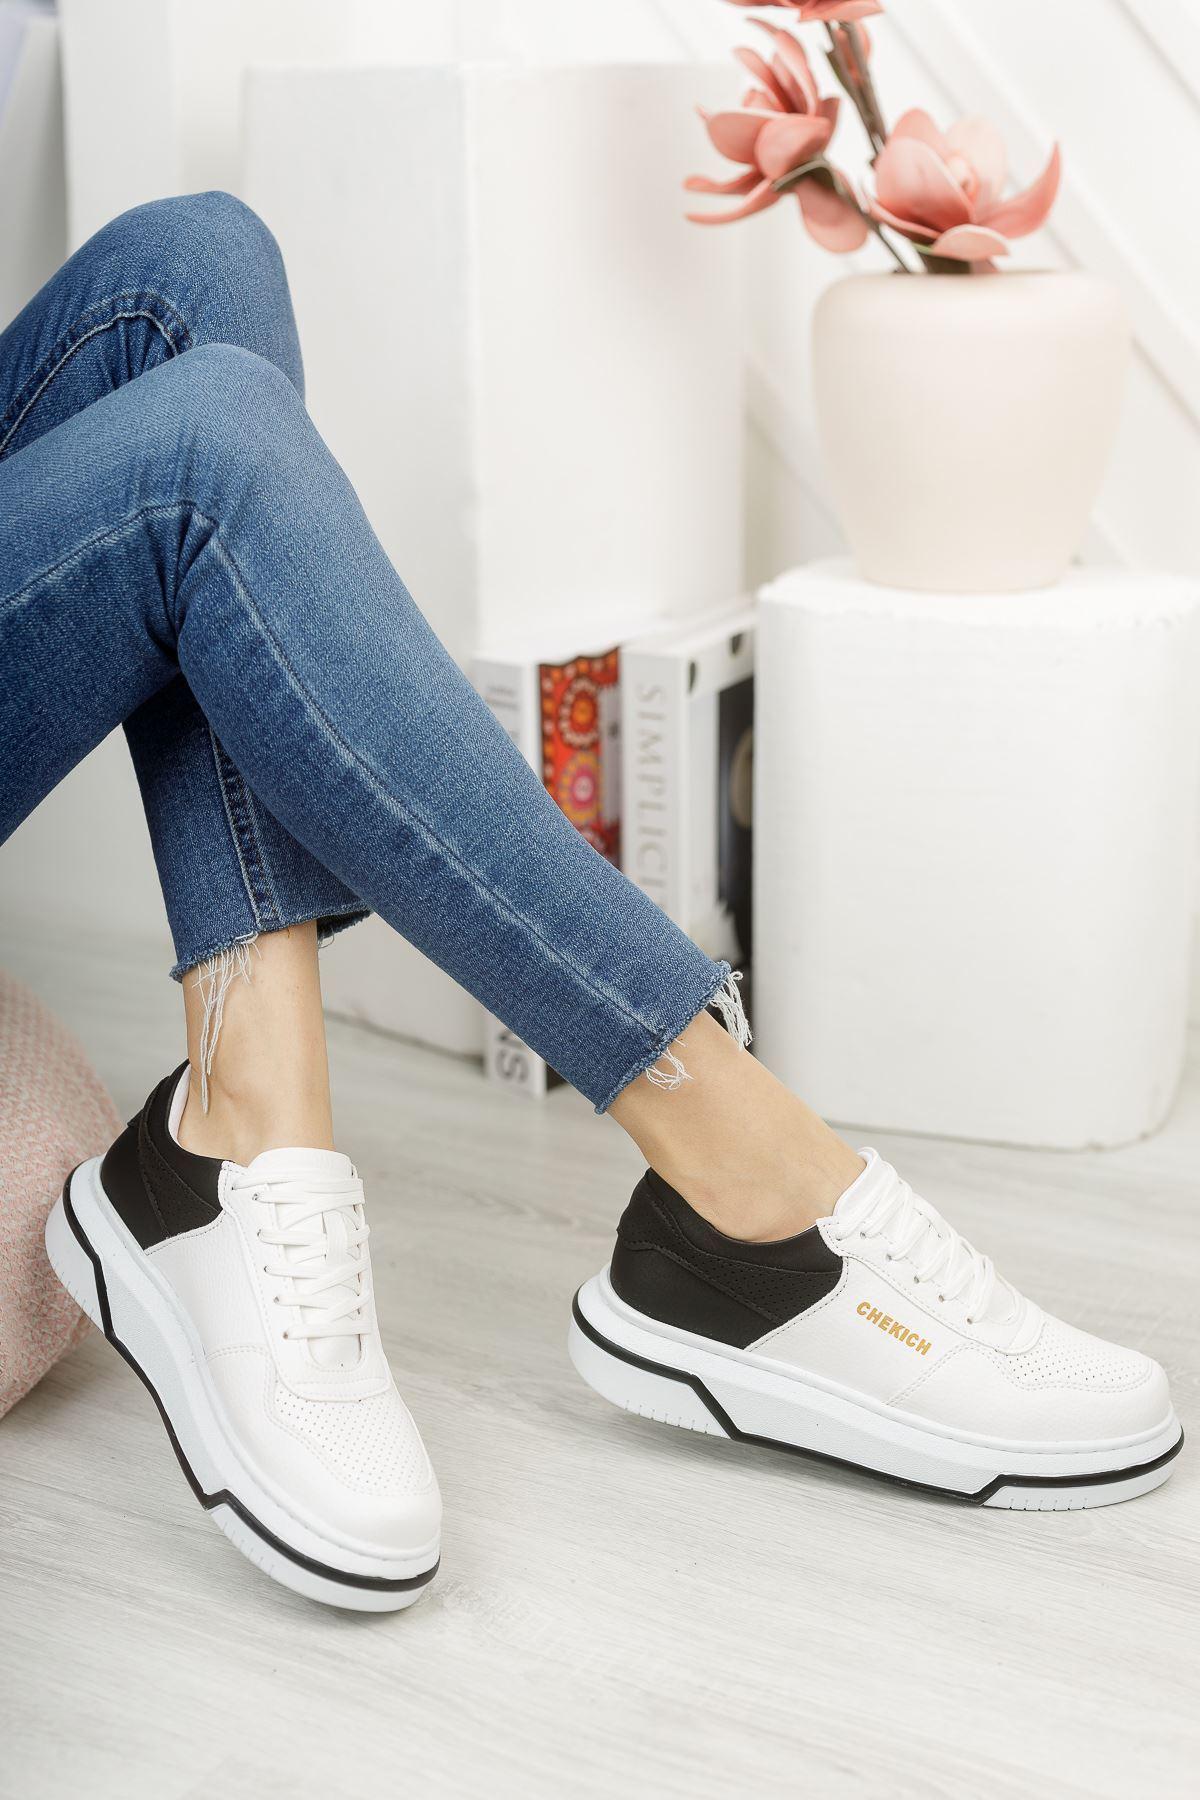 Chekich CH075 İpekyol BT Kadın Ayakkabı BEYAZ / SİYAH